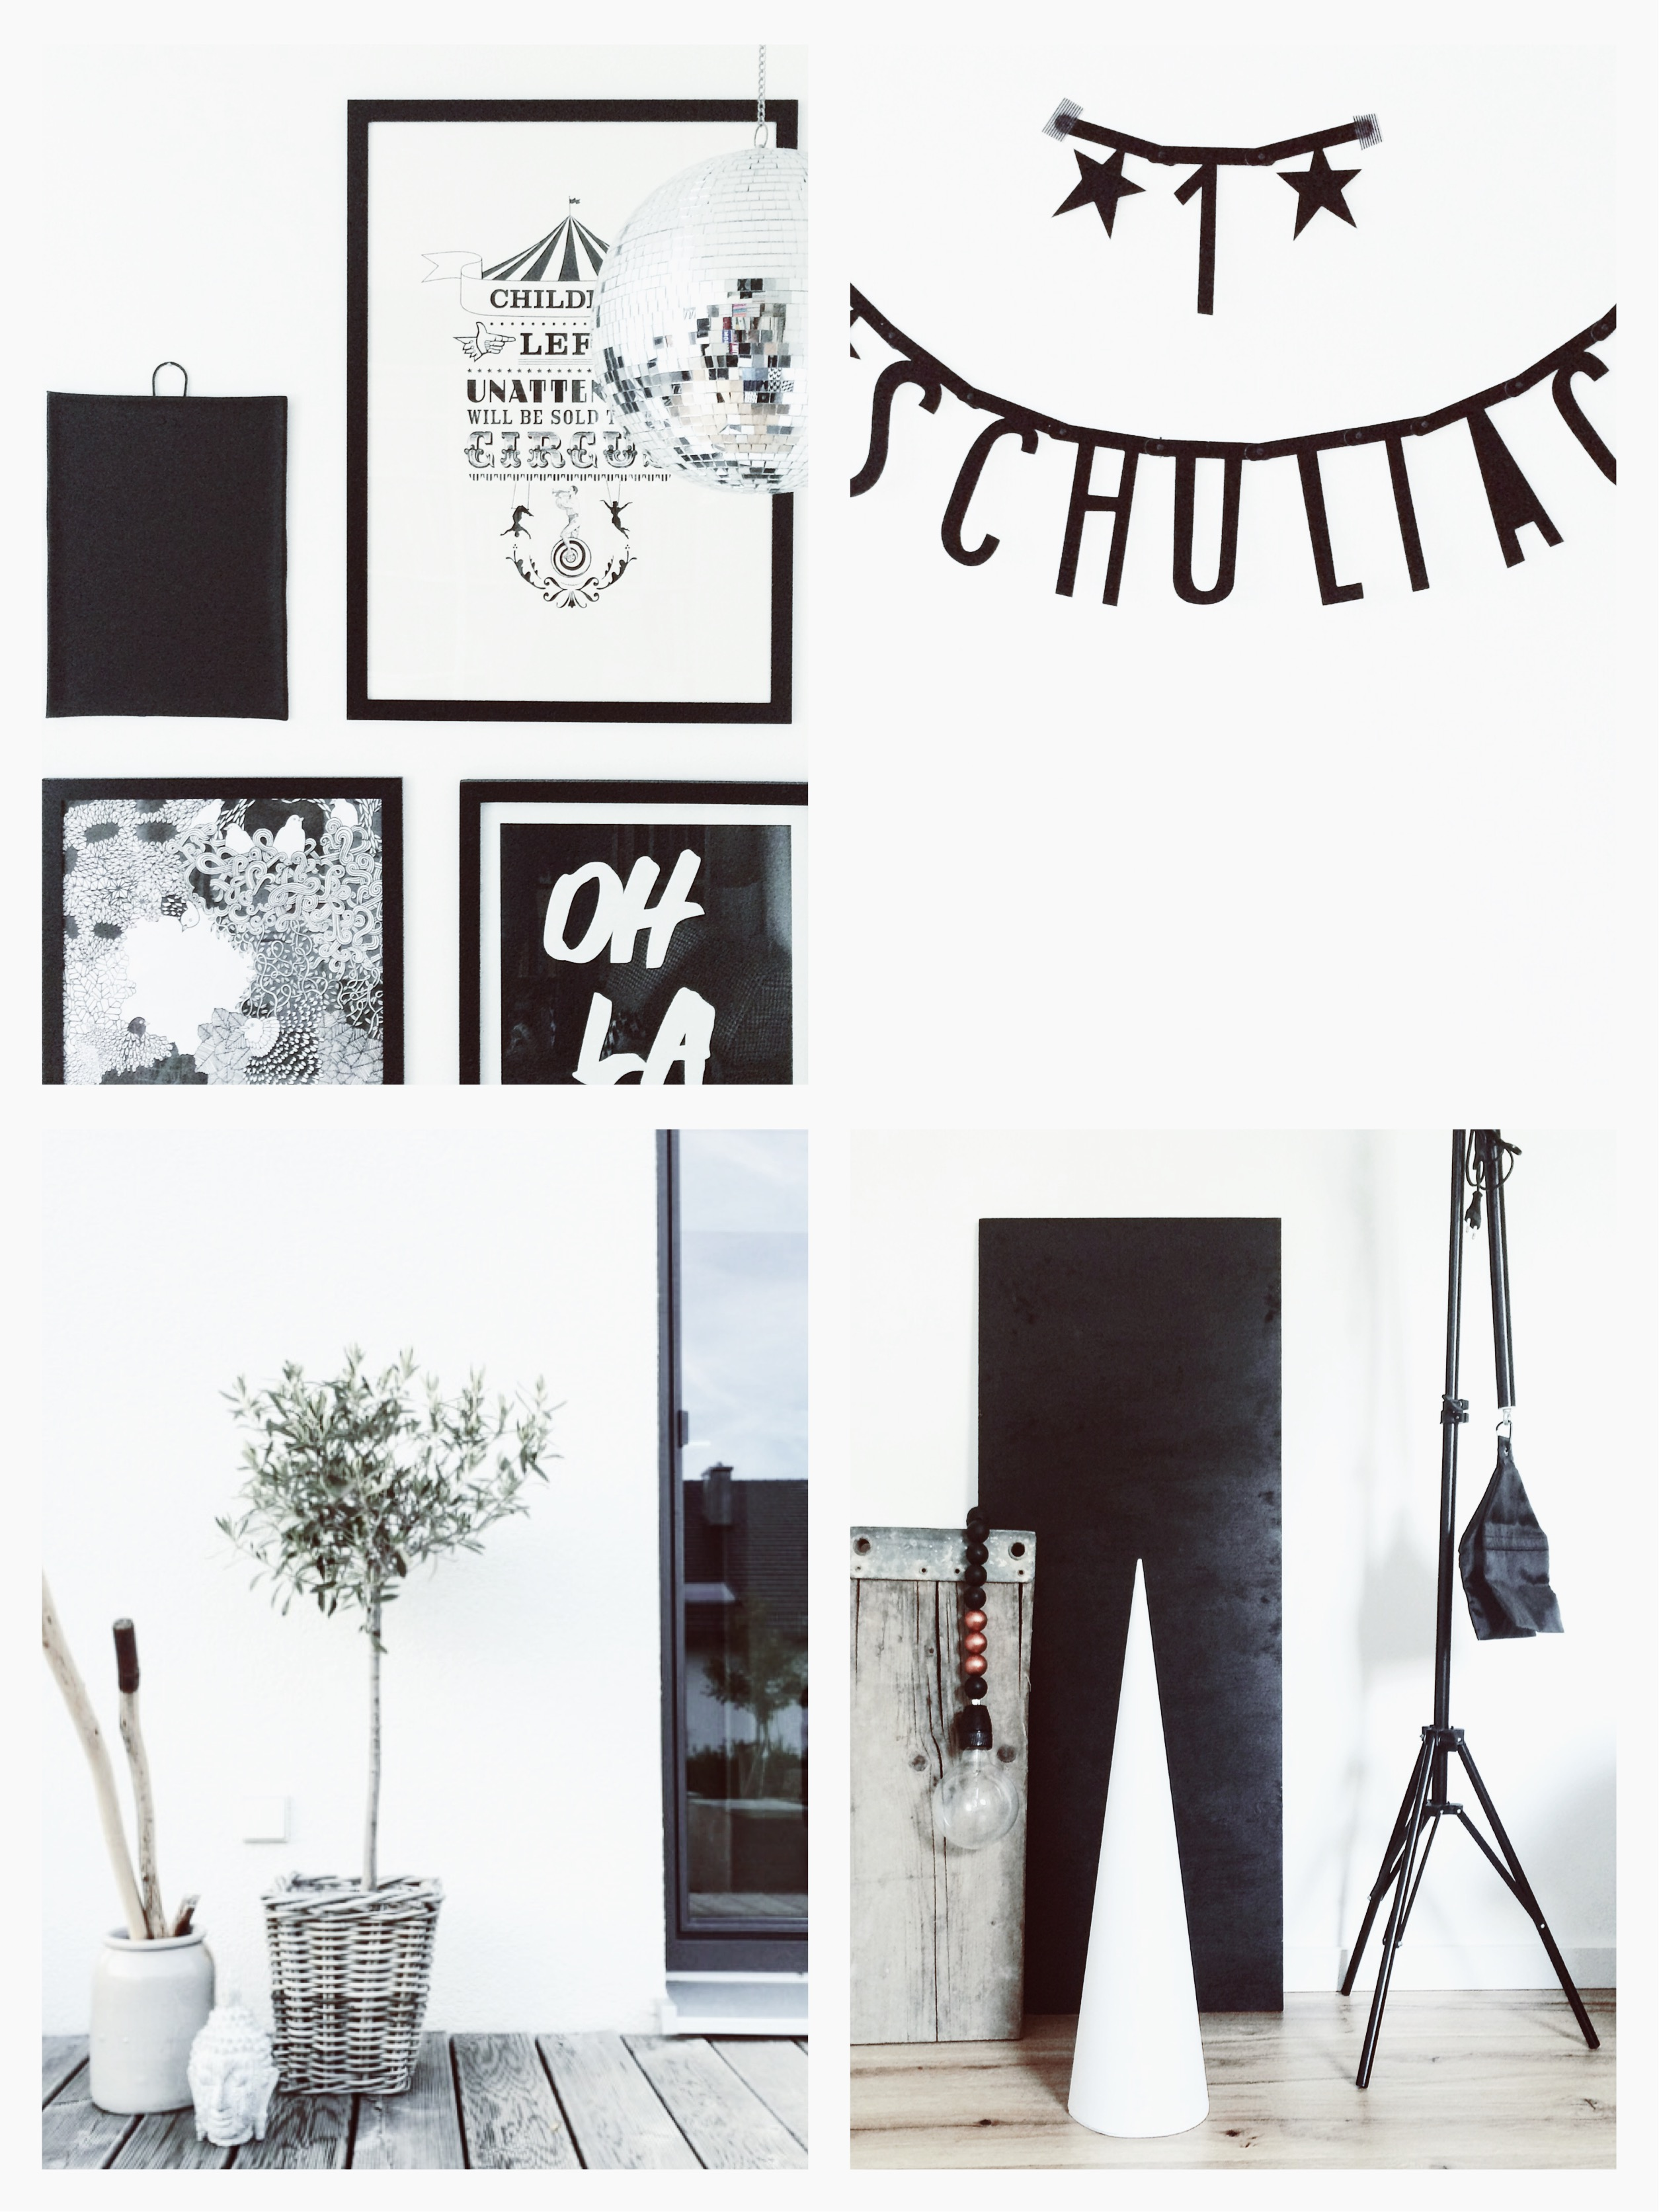 Collage-Oktober-Instagram-Jennadores-Blog-Rückblick-Einschulung_2015-Homeoffice-Einschulung-Terasse